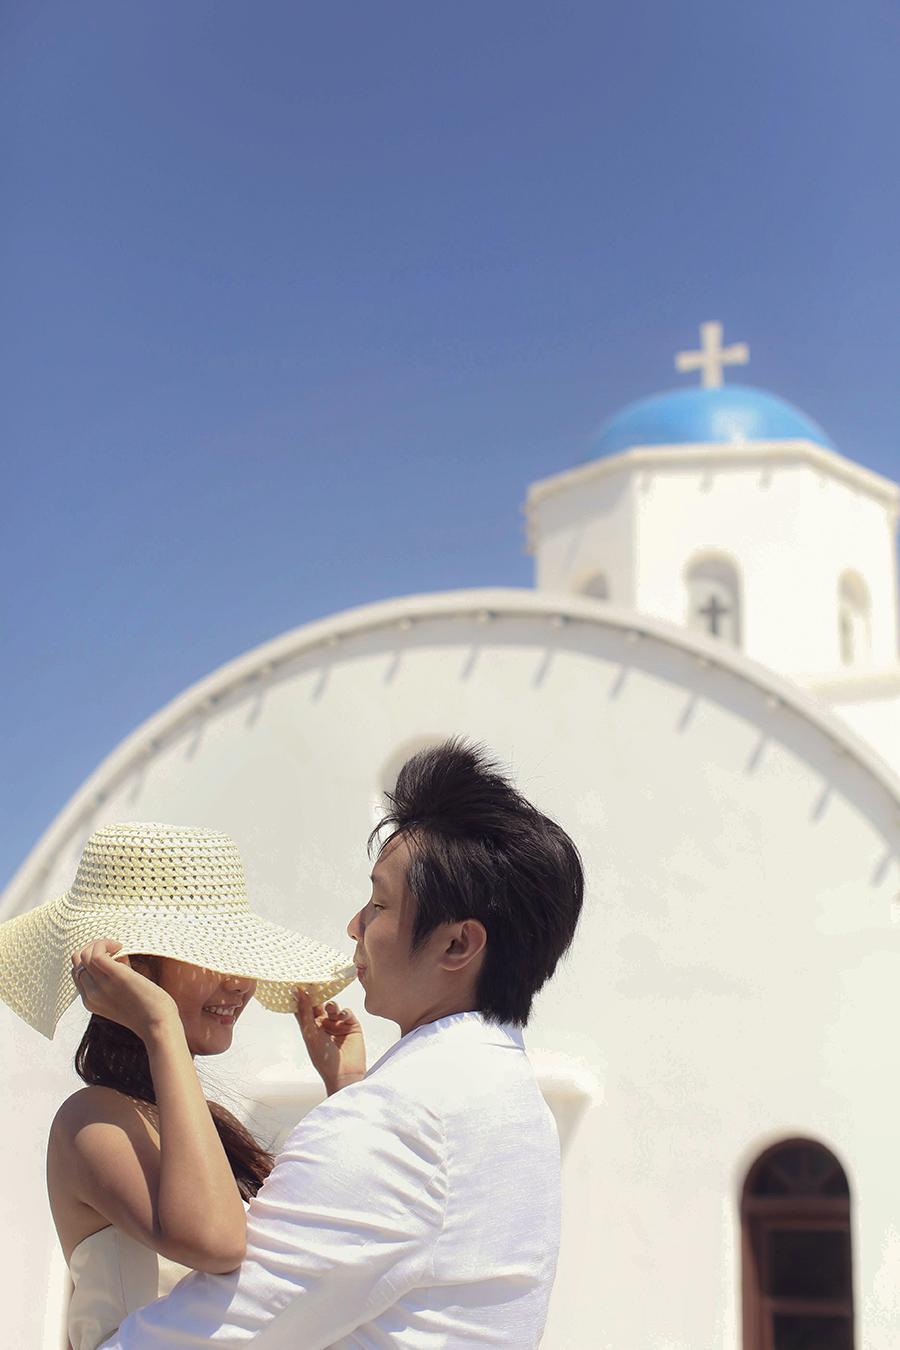 santorini greece . wedding photography by kurt ahs . 3070.jpg